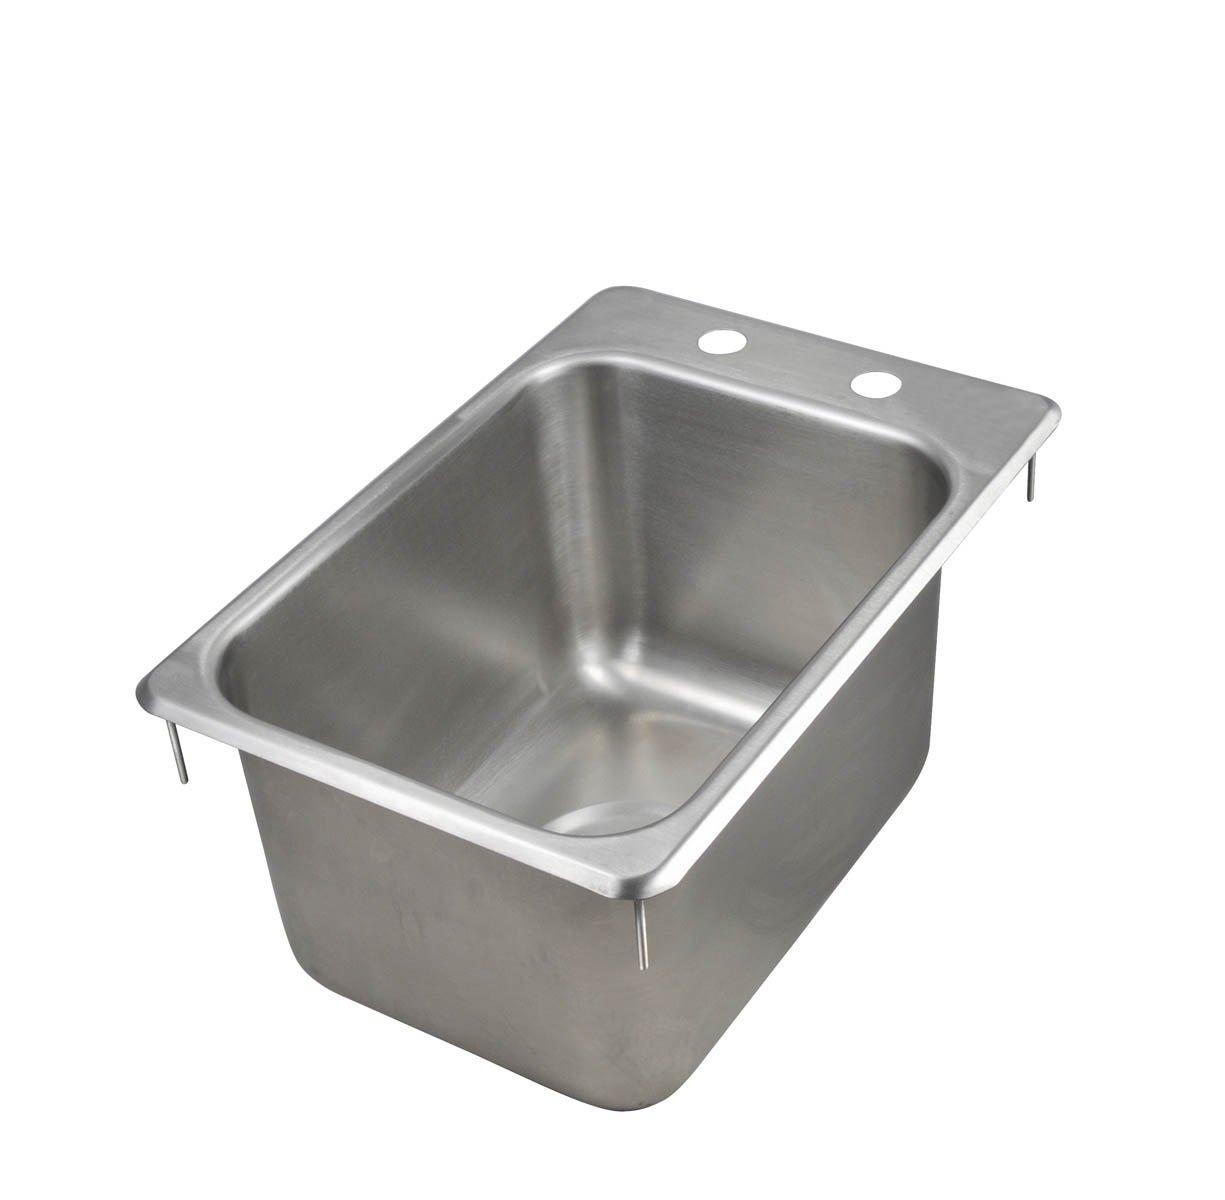 John Boos PB-DISINK101410 Deck Mount Pro-Bowl Drop-In Hand Sink, 14'' Length x 10'' Width x 10'' Depth